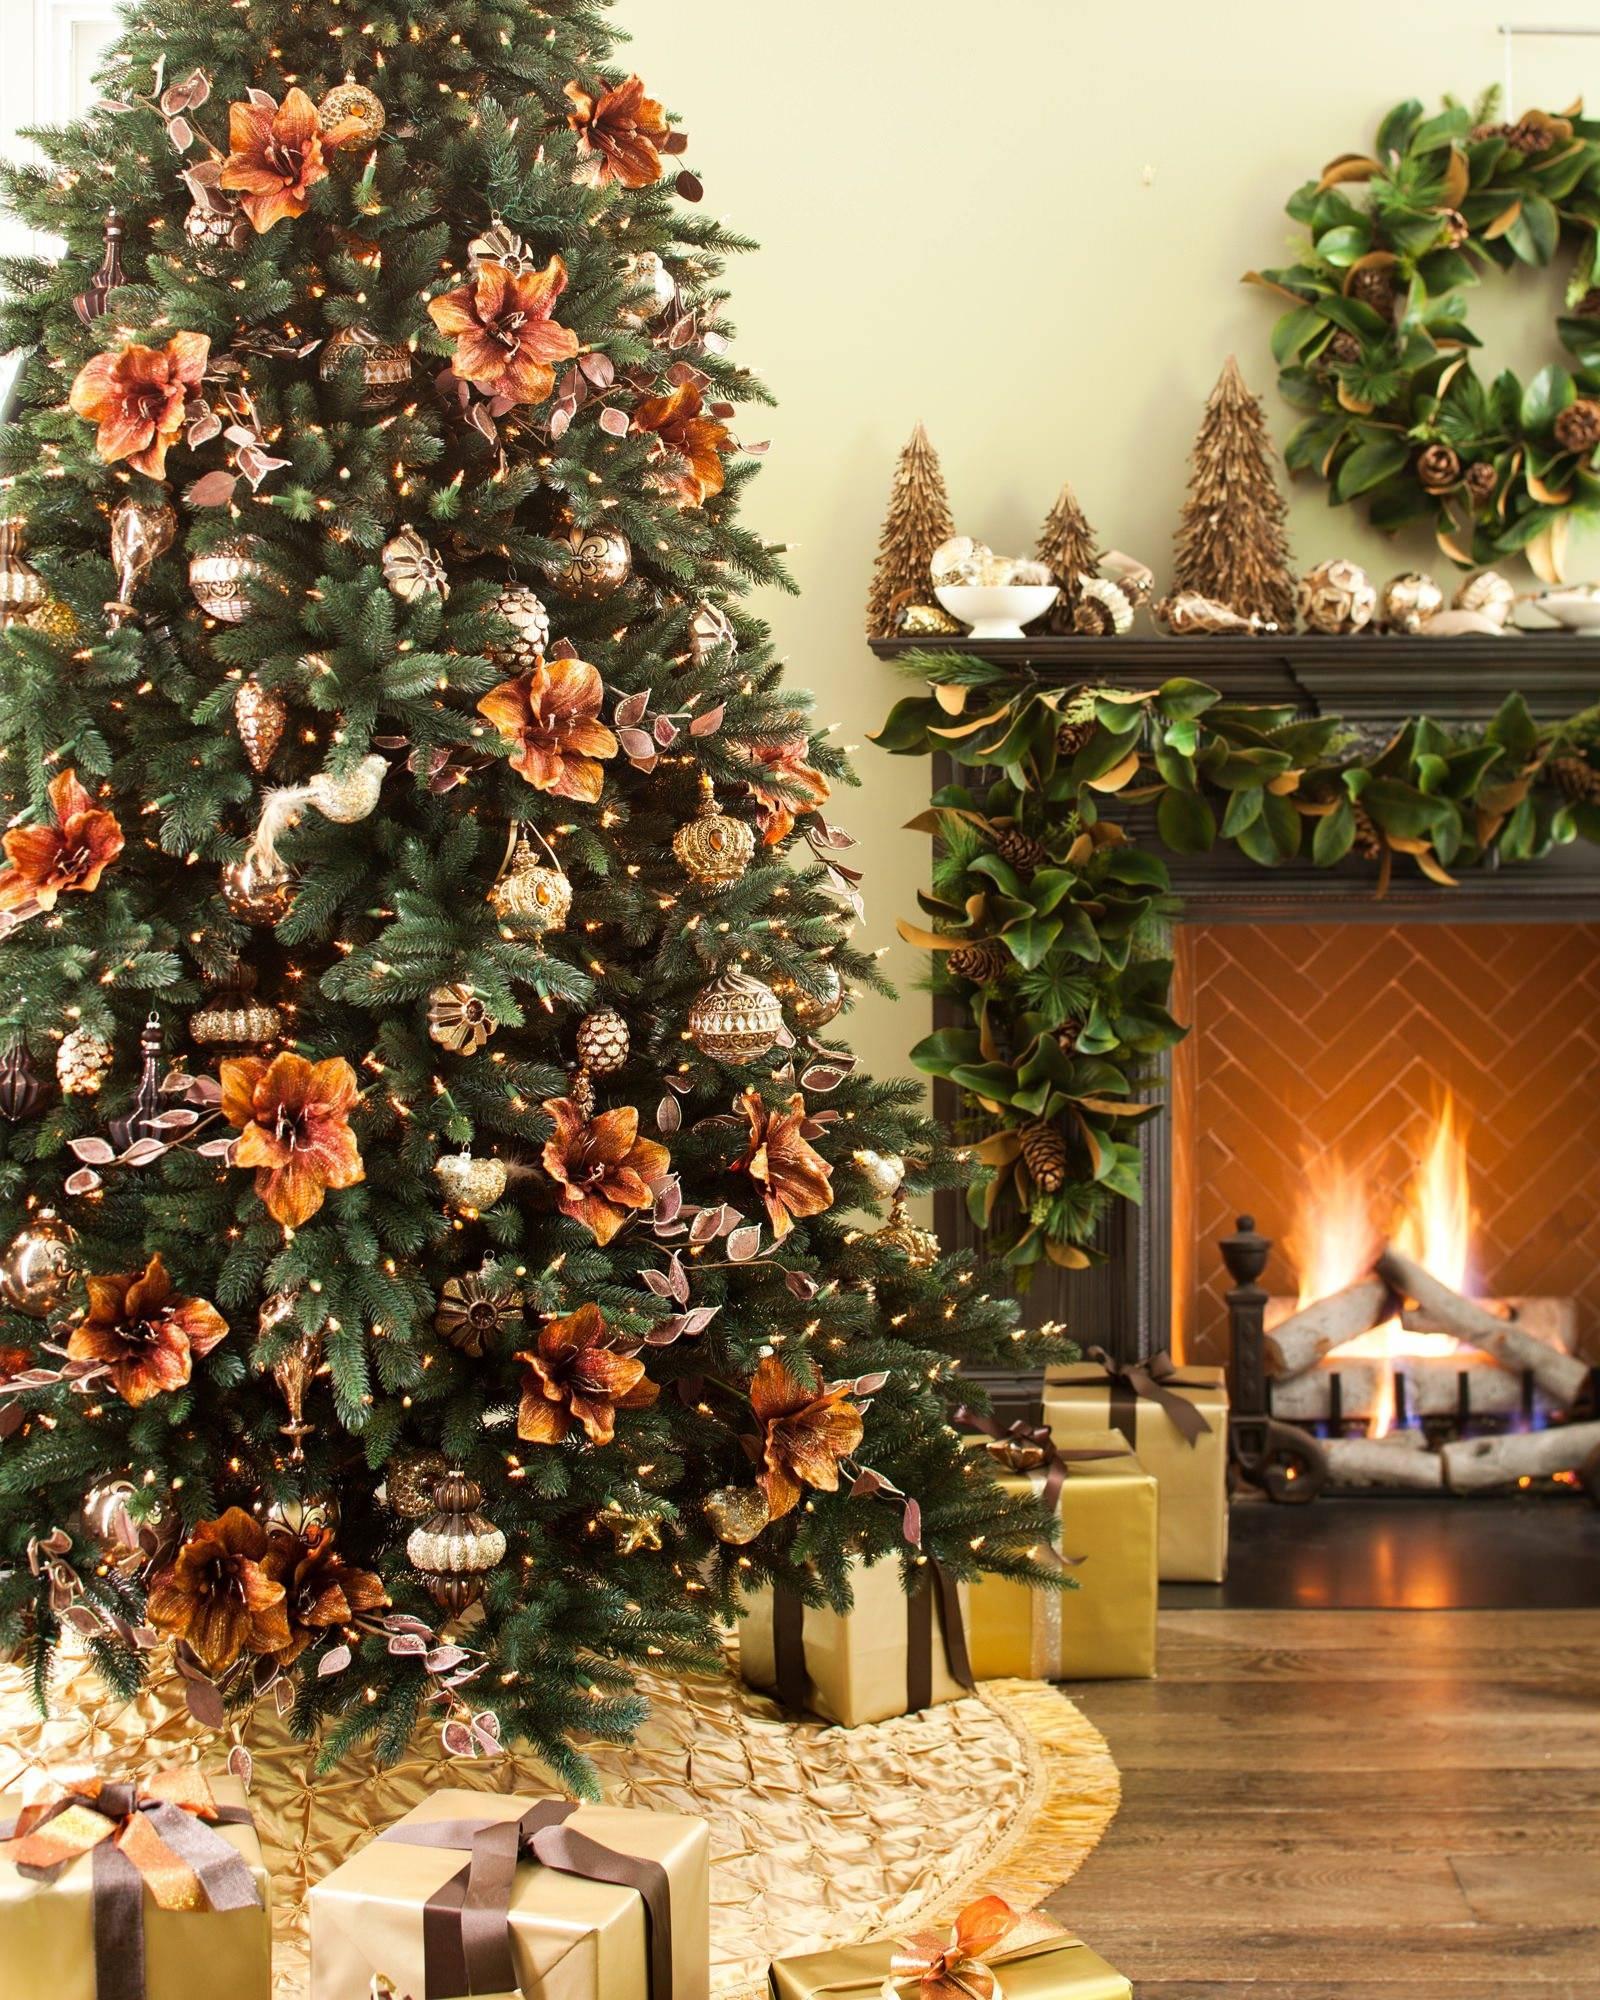 Christmas ornament sets for tree -  Gramercy Park Glass Ornament Set 30 Pieces Alt